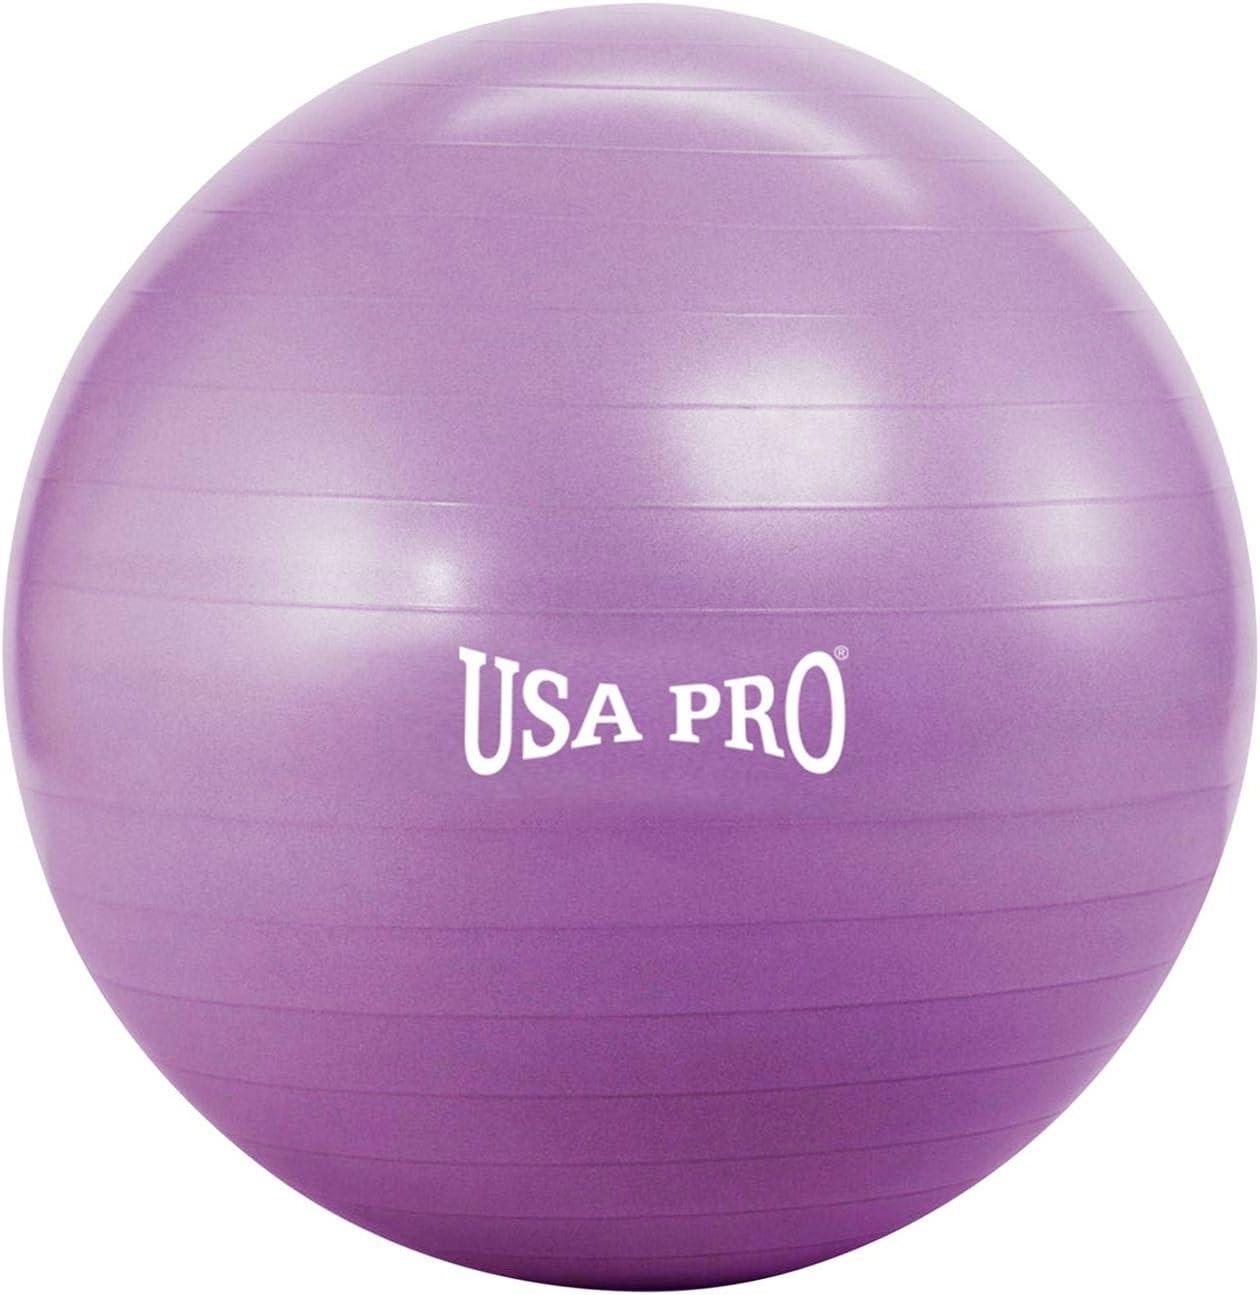 USA Pro Yoga pelota ejercicio aeróbico gimnasio abdominales ...